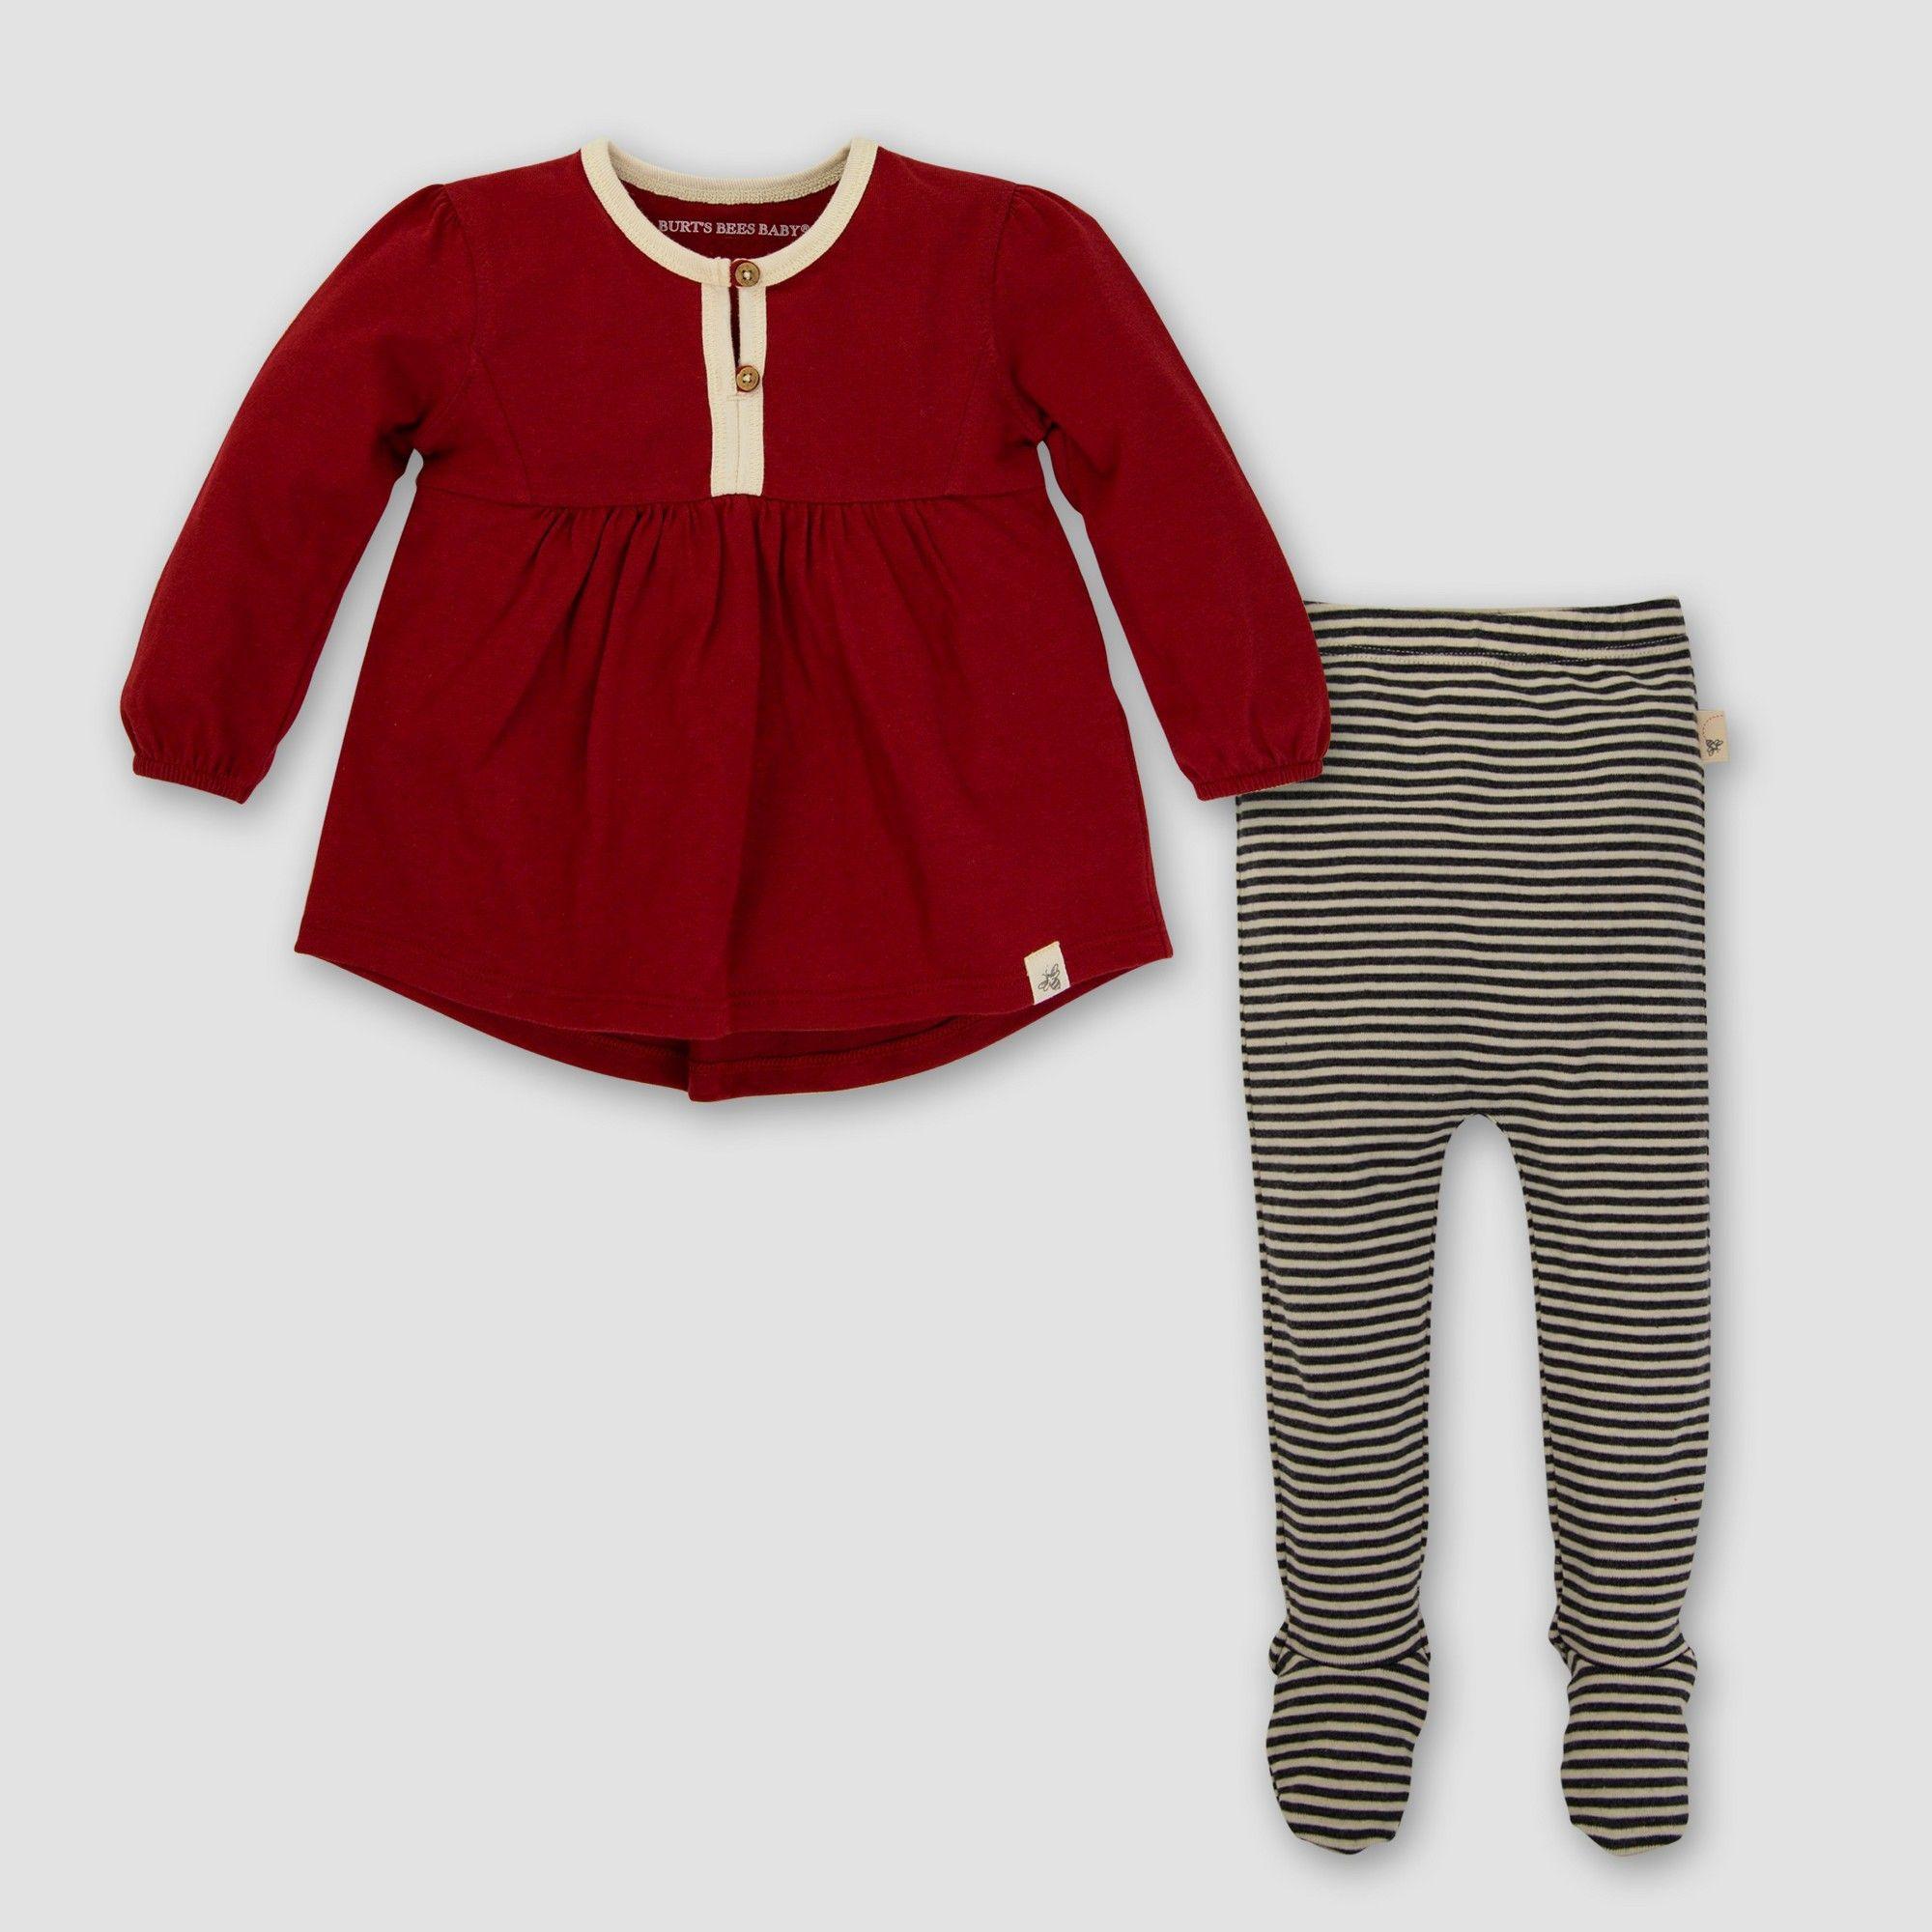 6b5e54b95 Burt s Bees Baby Girls  Organic Billowing Dress   Pant Set - Red 6 ...